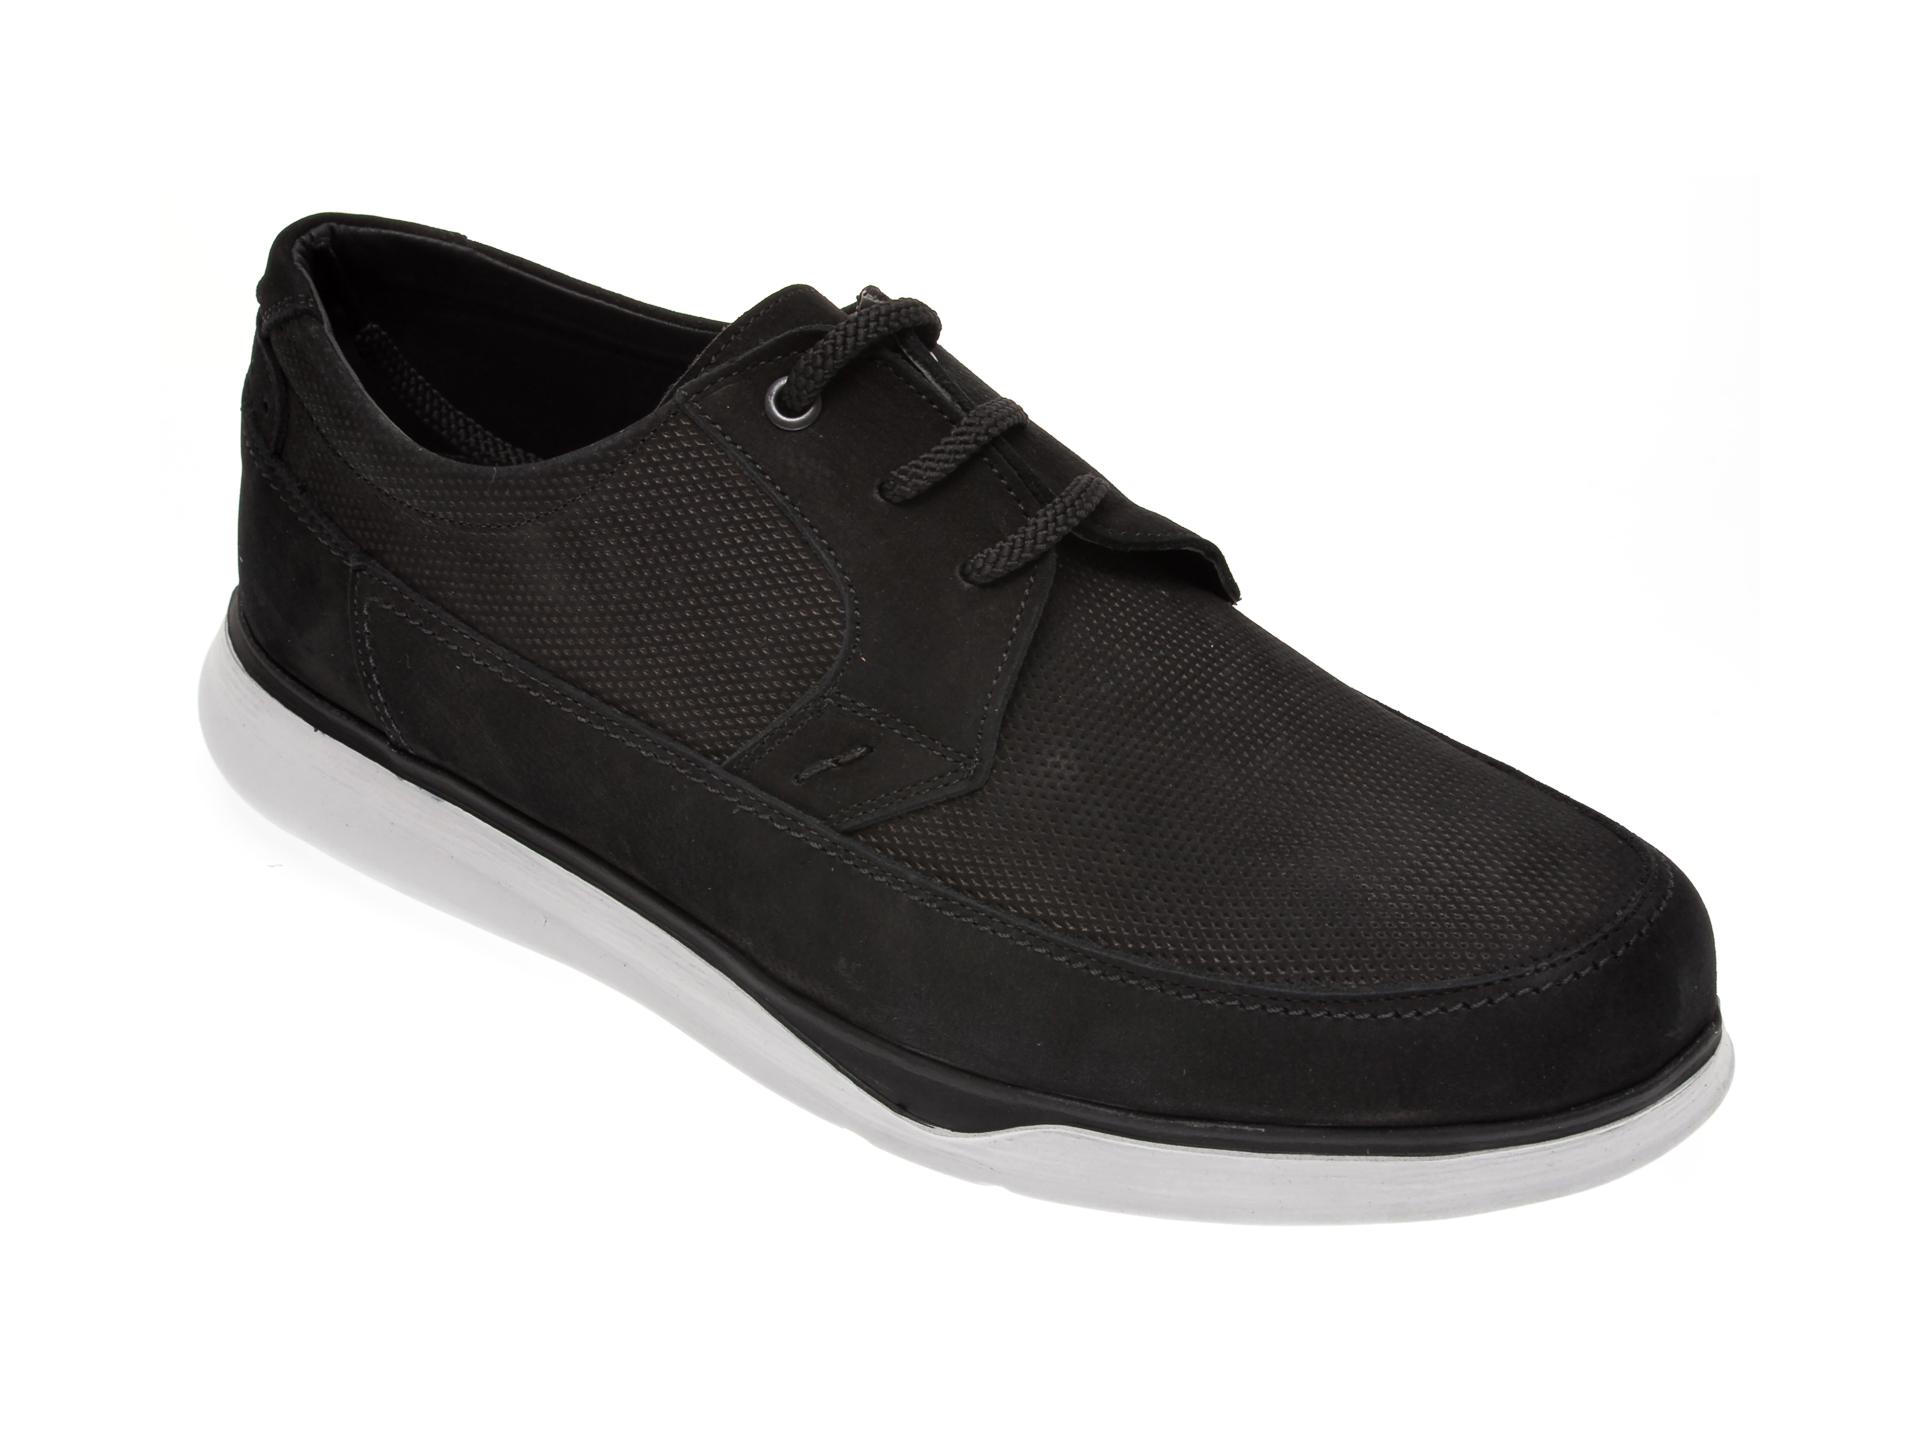 Pantofi OTTER negri, 19332, din piele intoarsa imagine